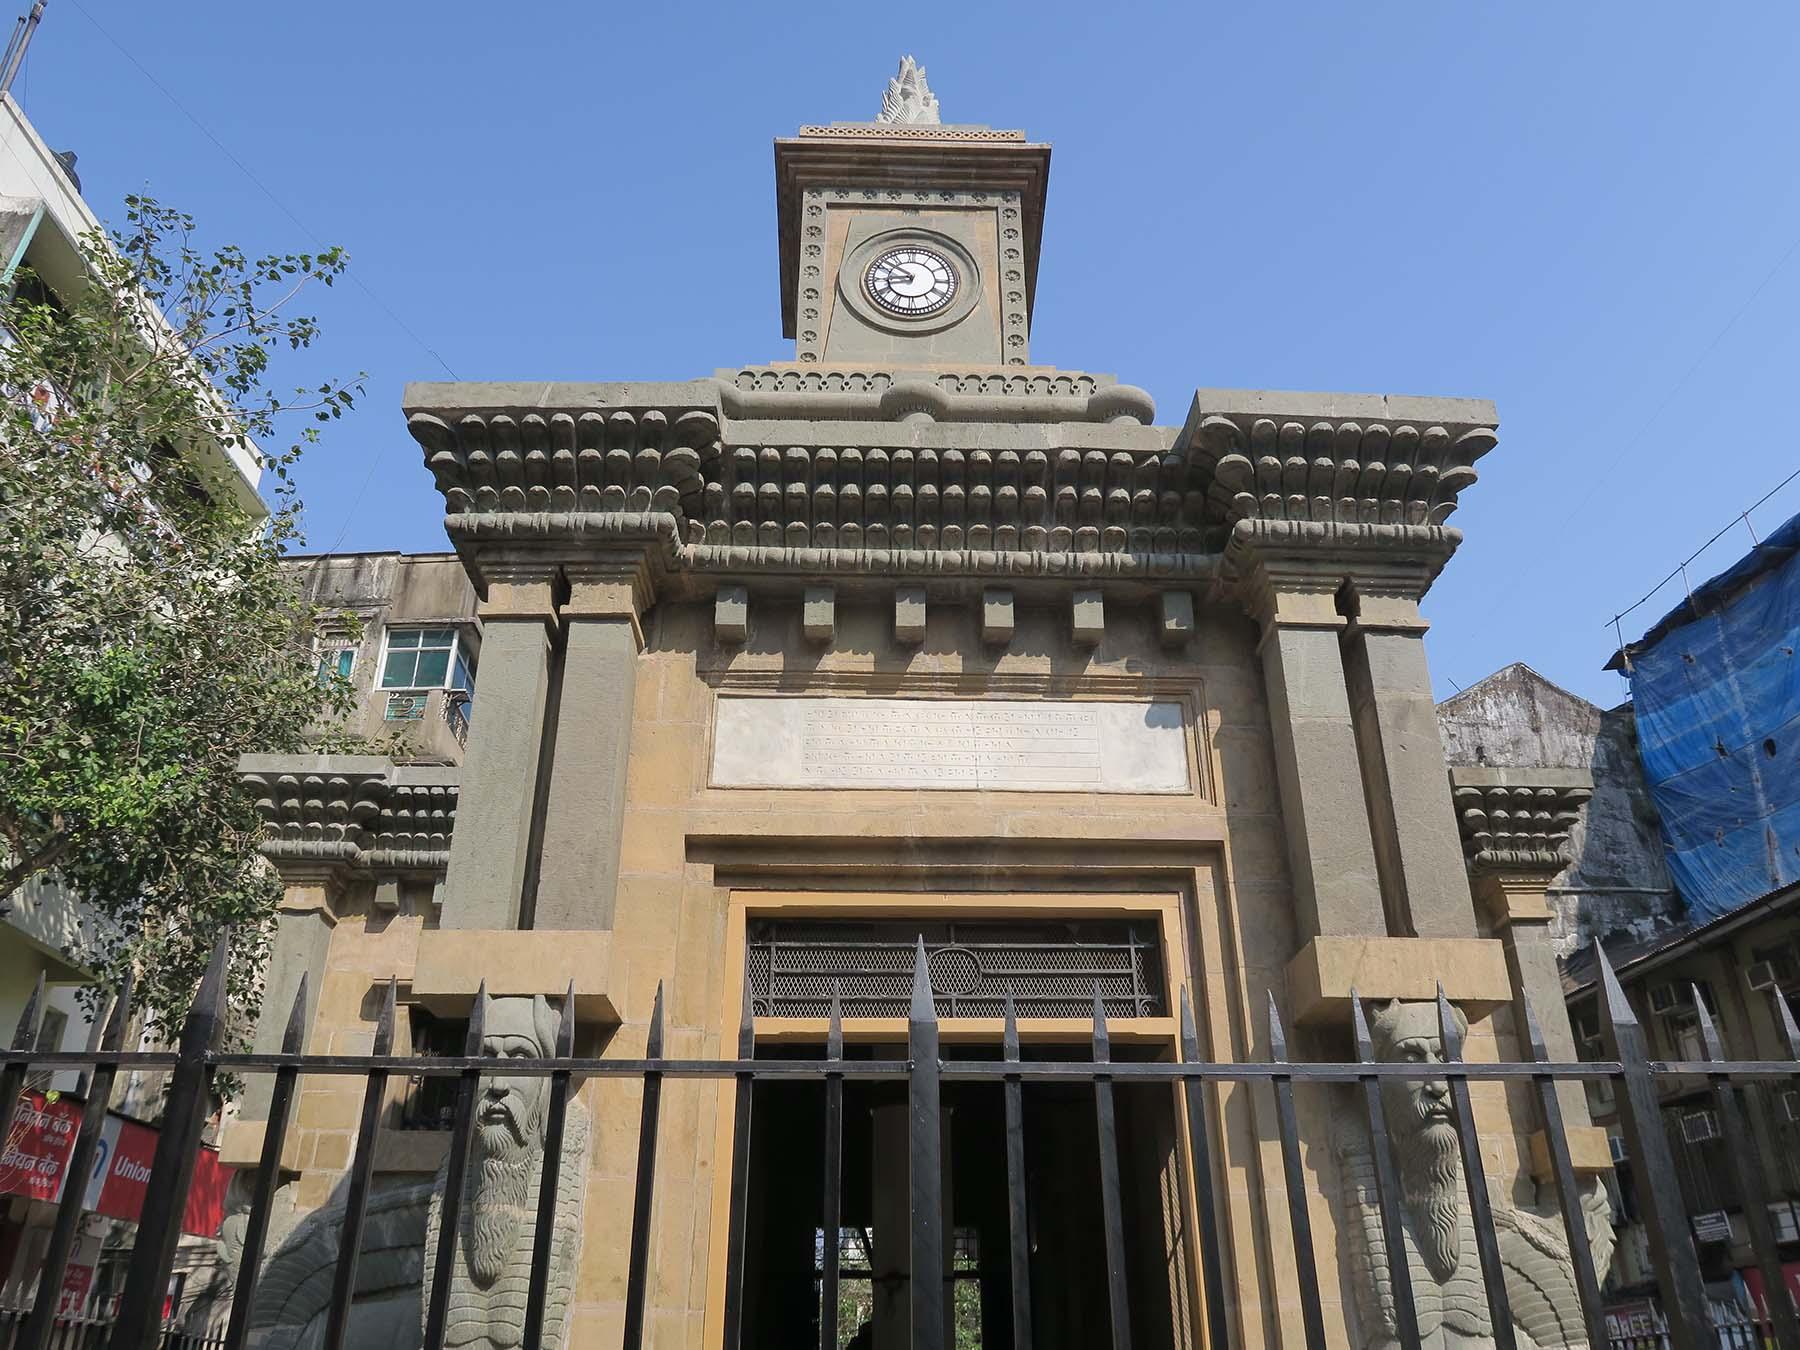 Bomanjee Hormarjee Wadia Fountain and Clock Tower, Mumbai